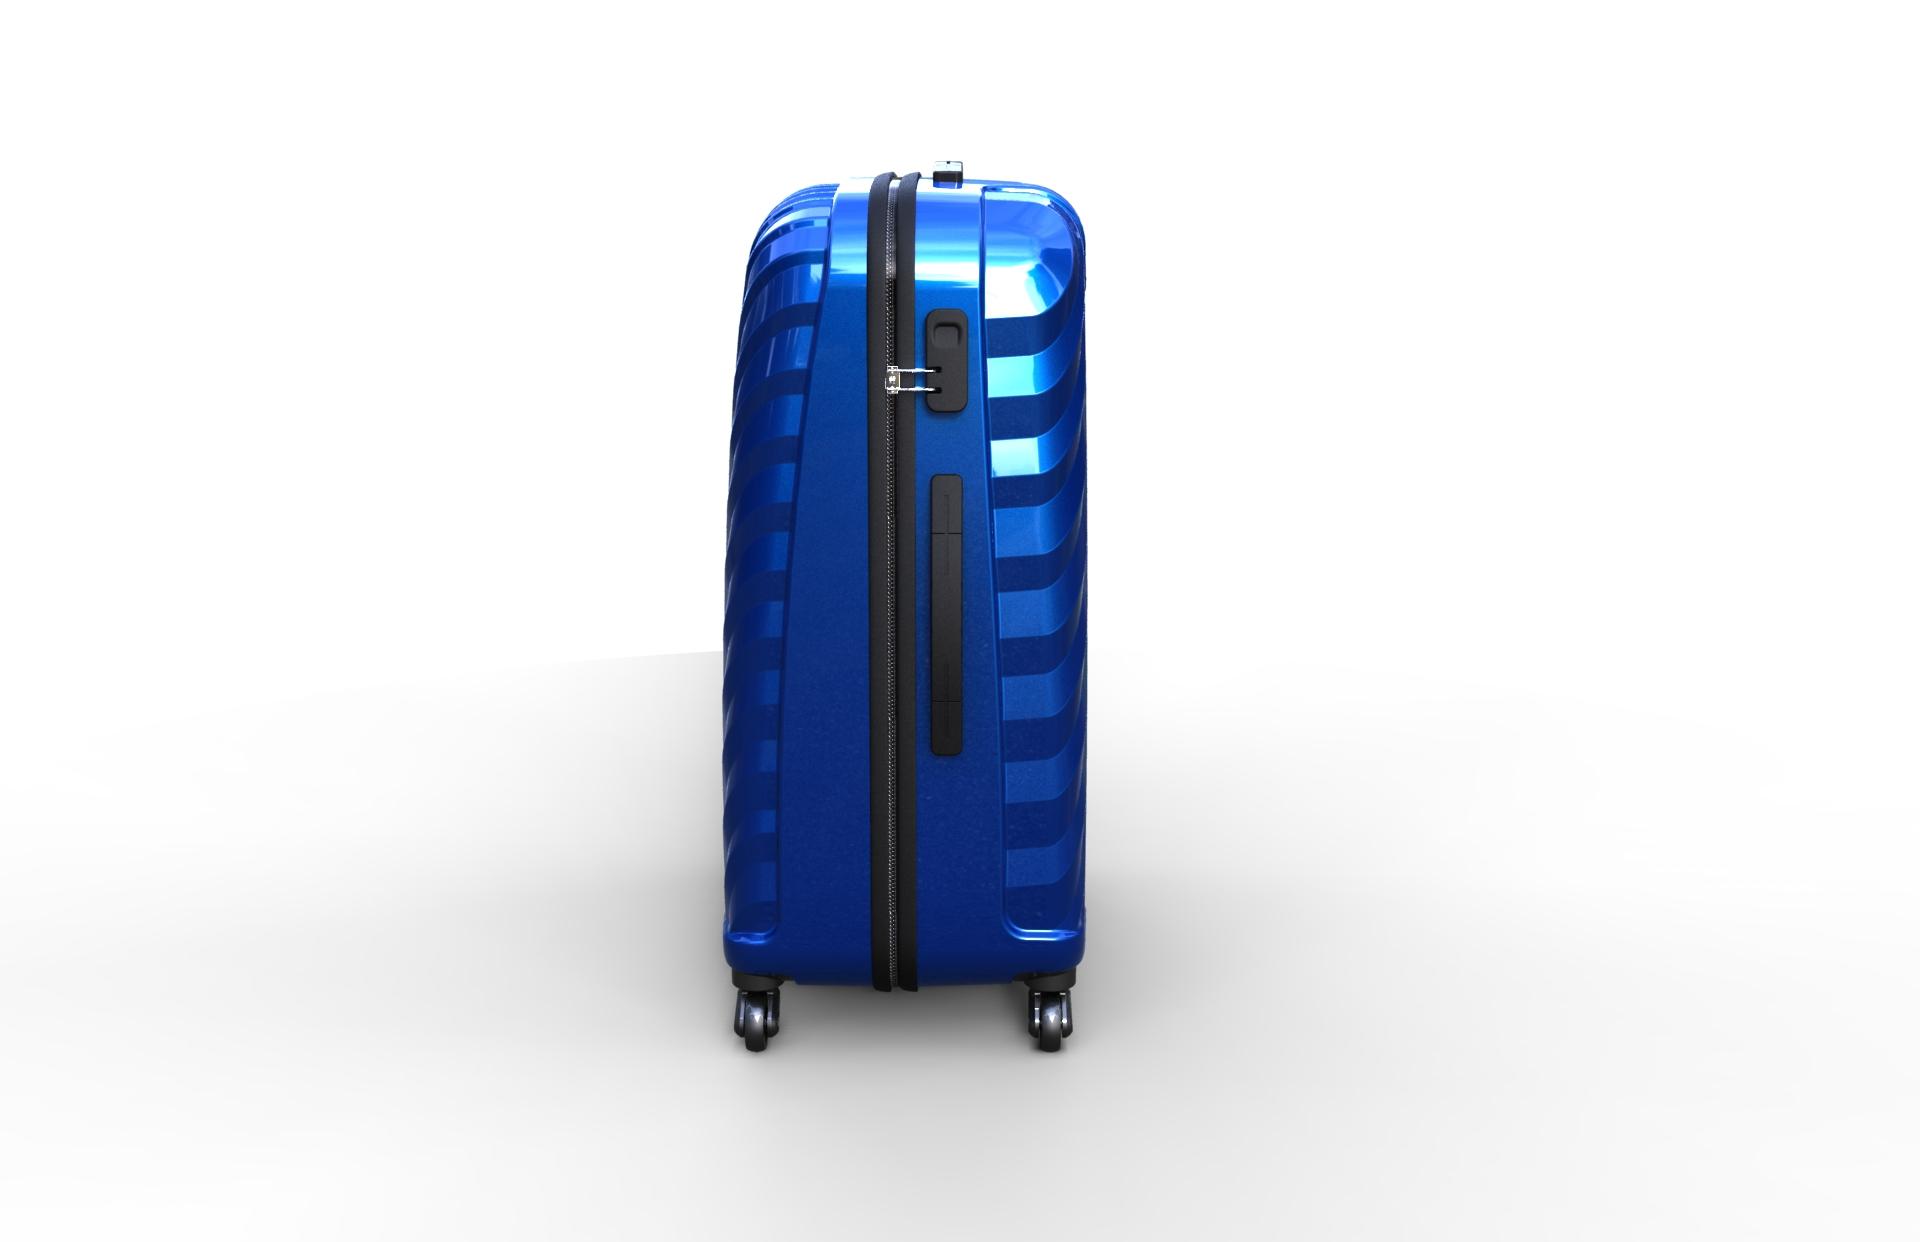 trolley suitcase bag 03 3d model max fbx ma mb obj 286008